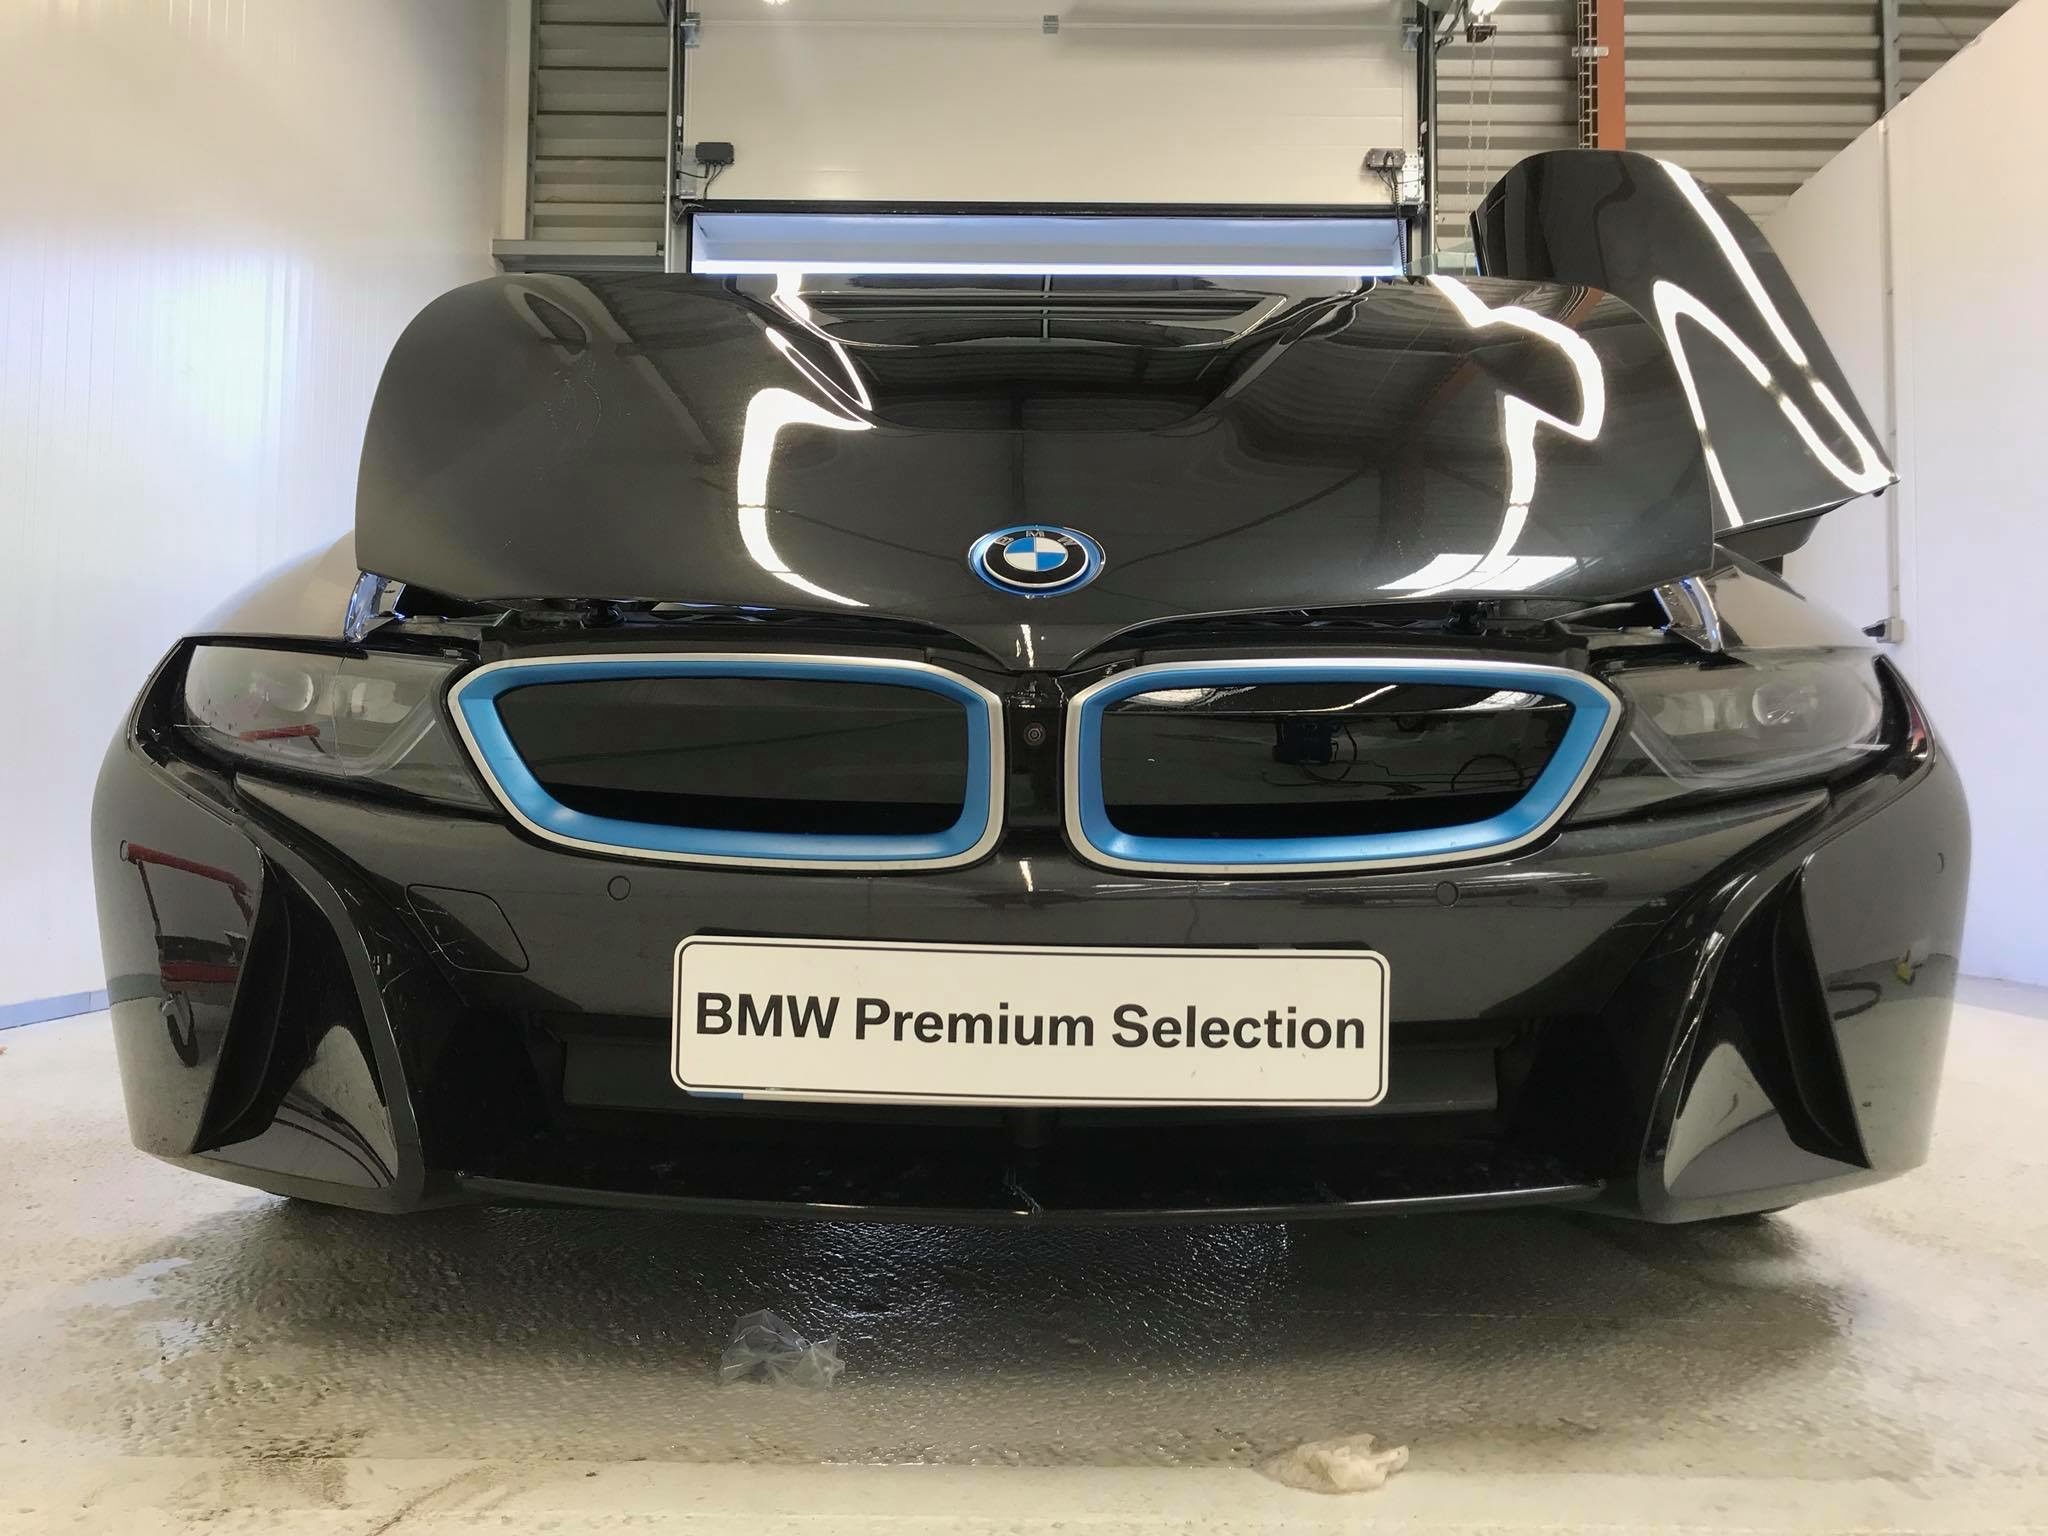 Bodyfence protection de carrosserie BMW I8 Roadster groupe Lempereur